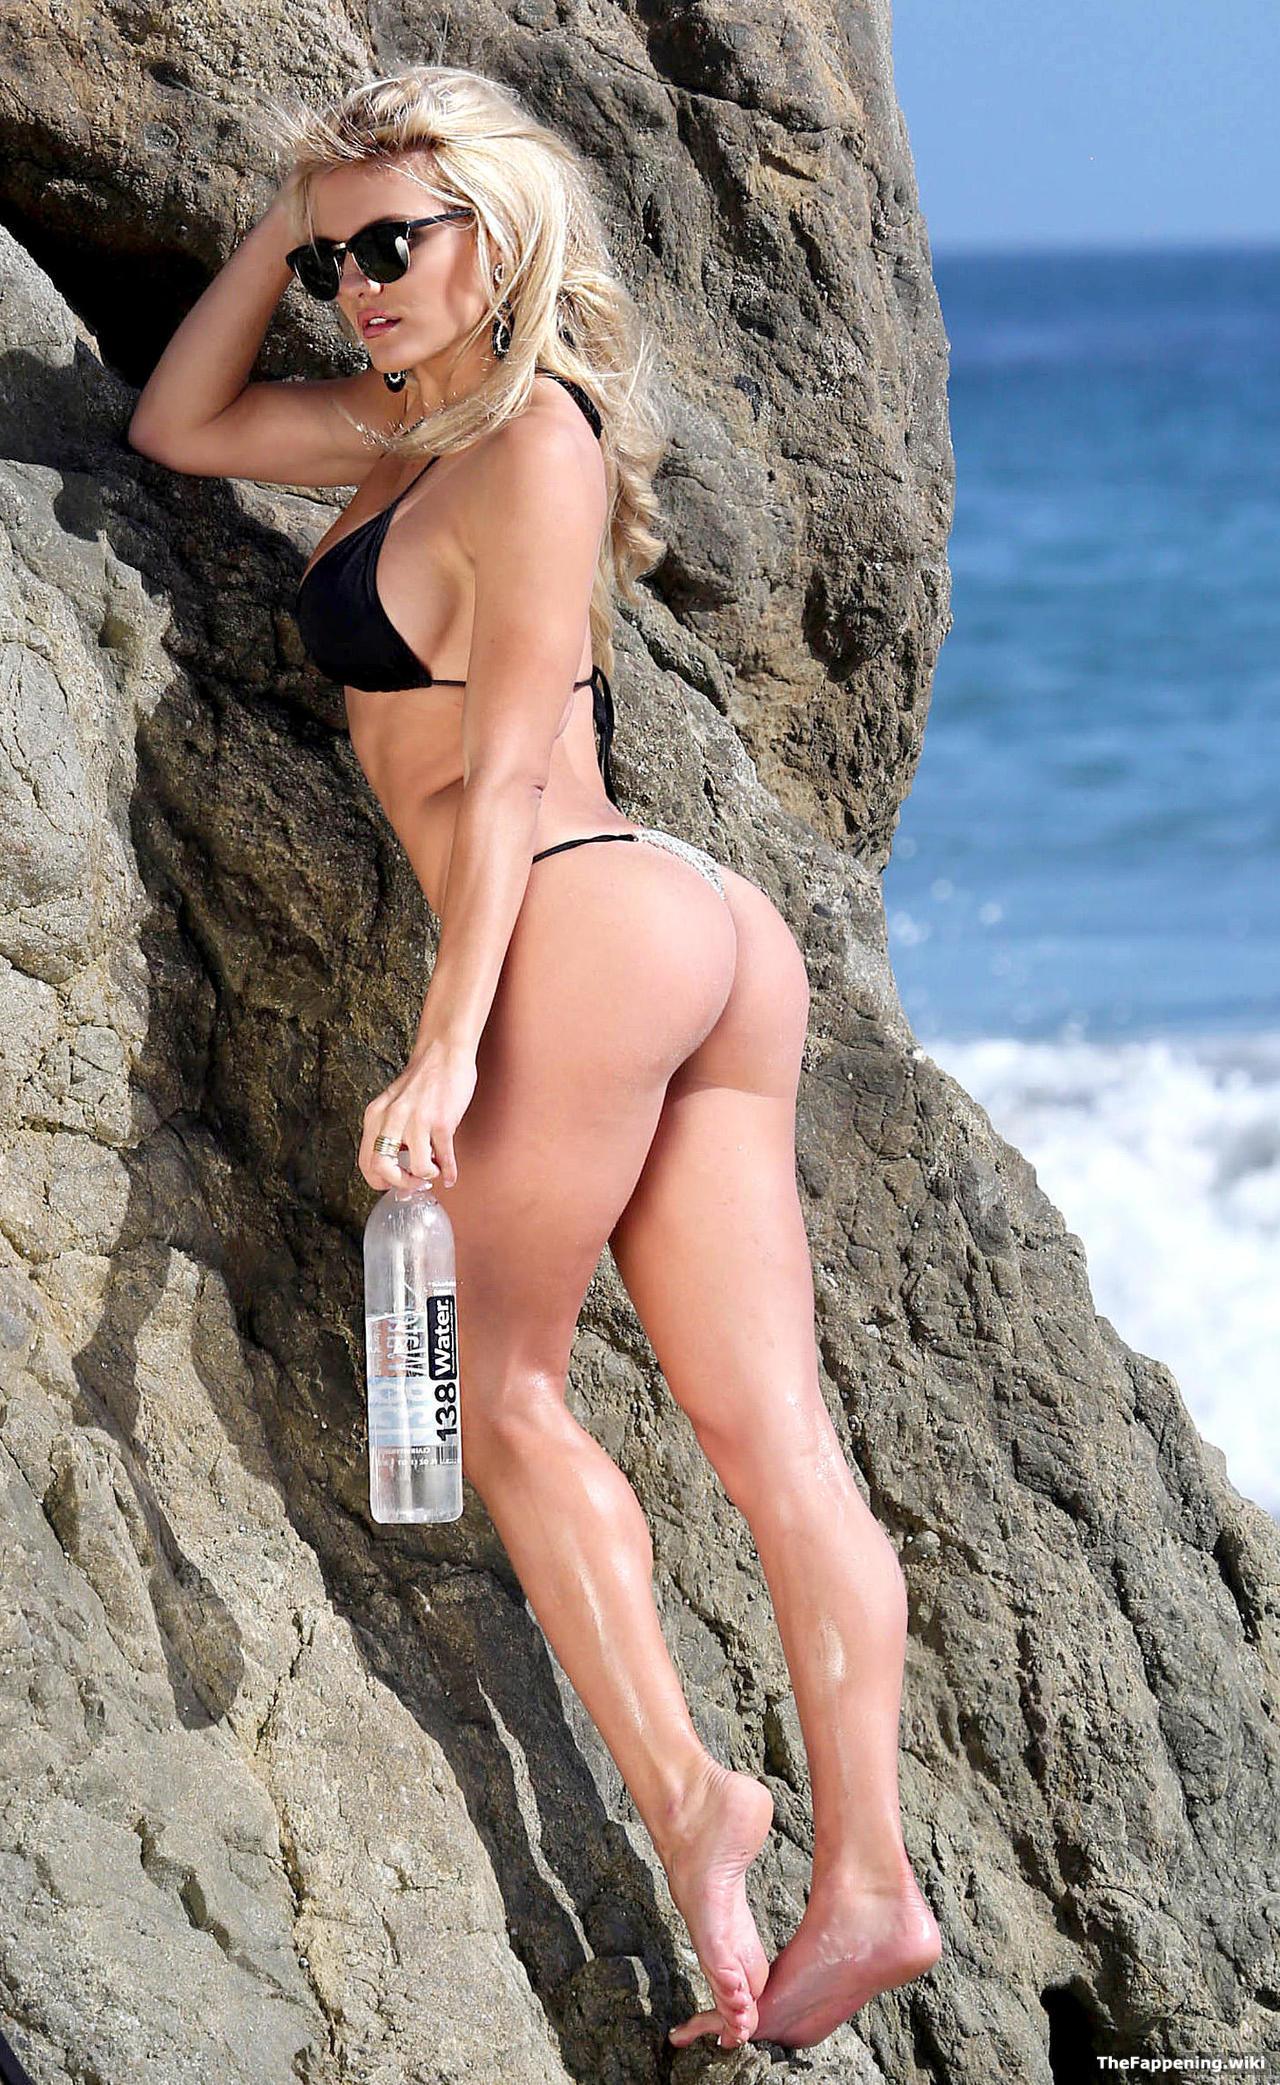 XXX Marissa Everhart nude photos 2019